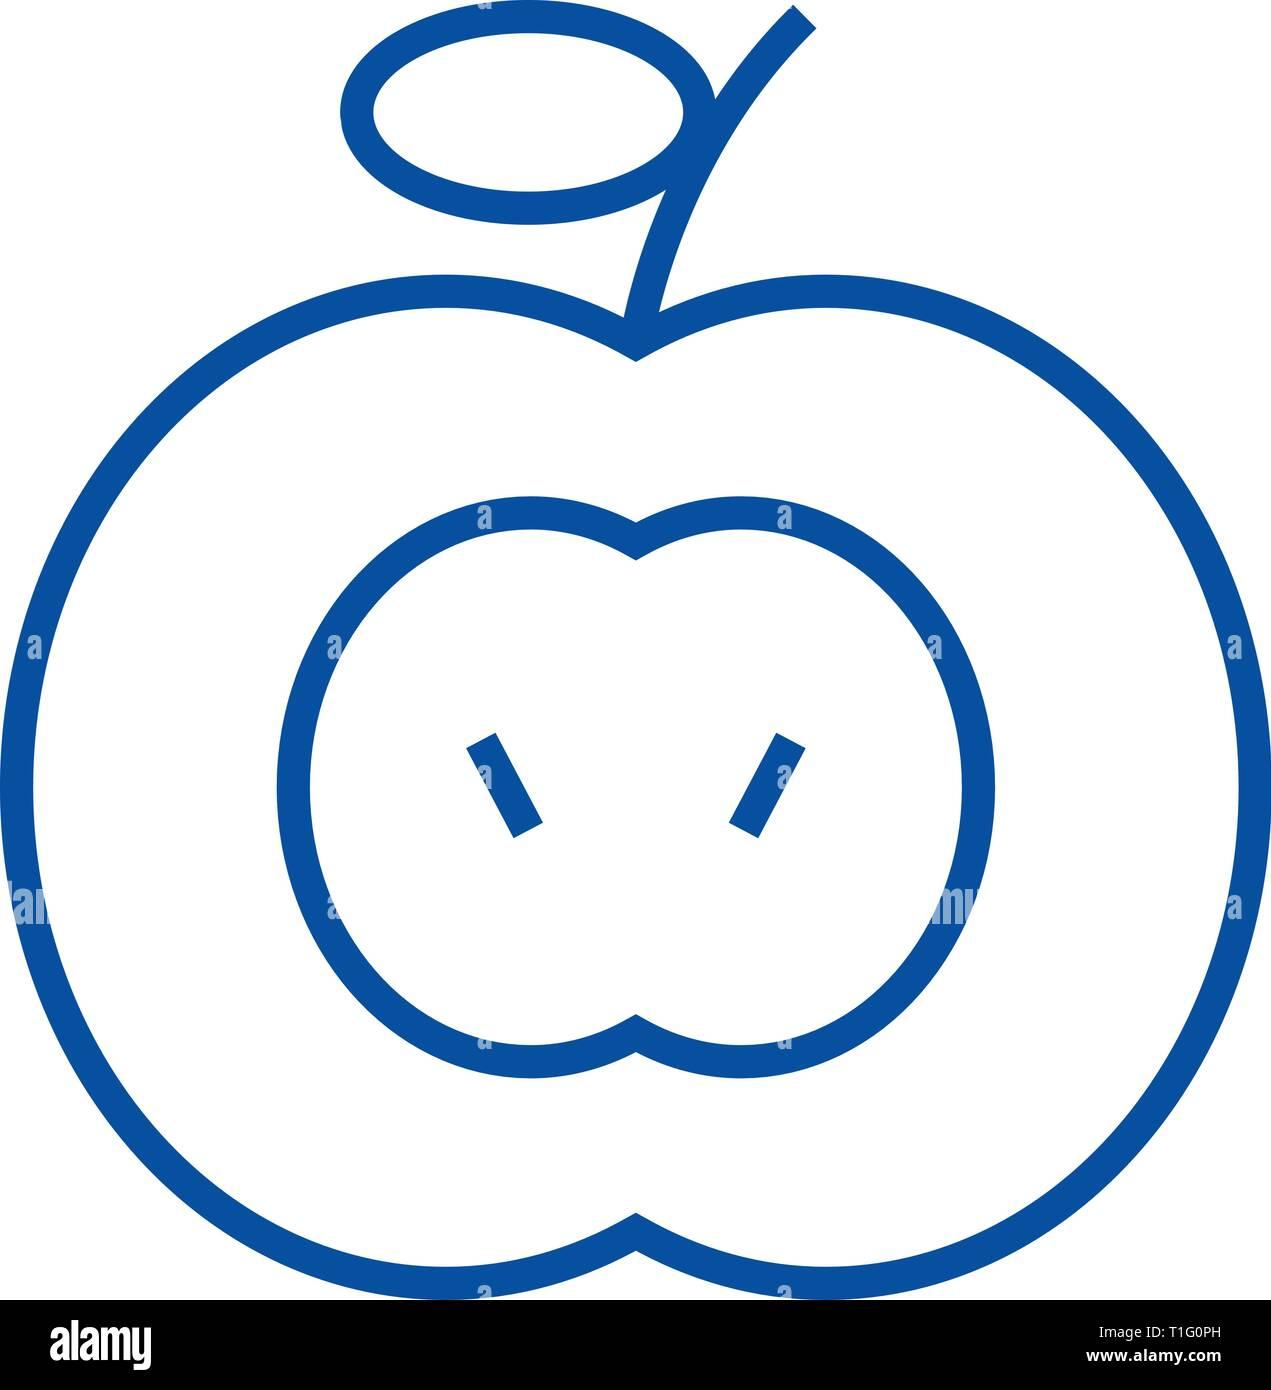 Apple Symbol Stock Photos & Apple Symbol Stock Images - Alamy